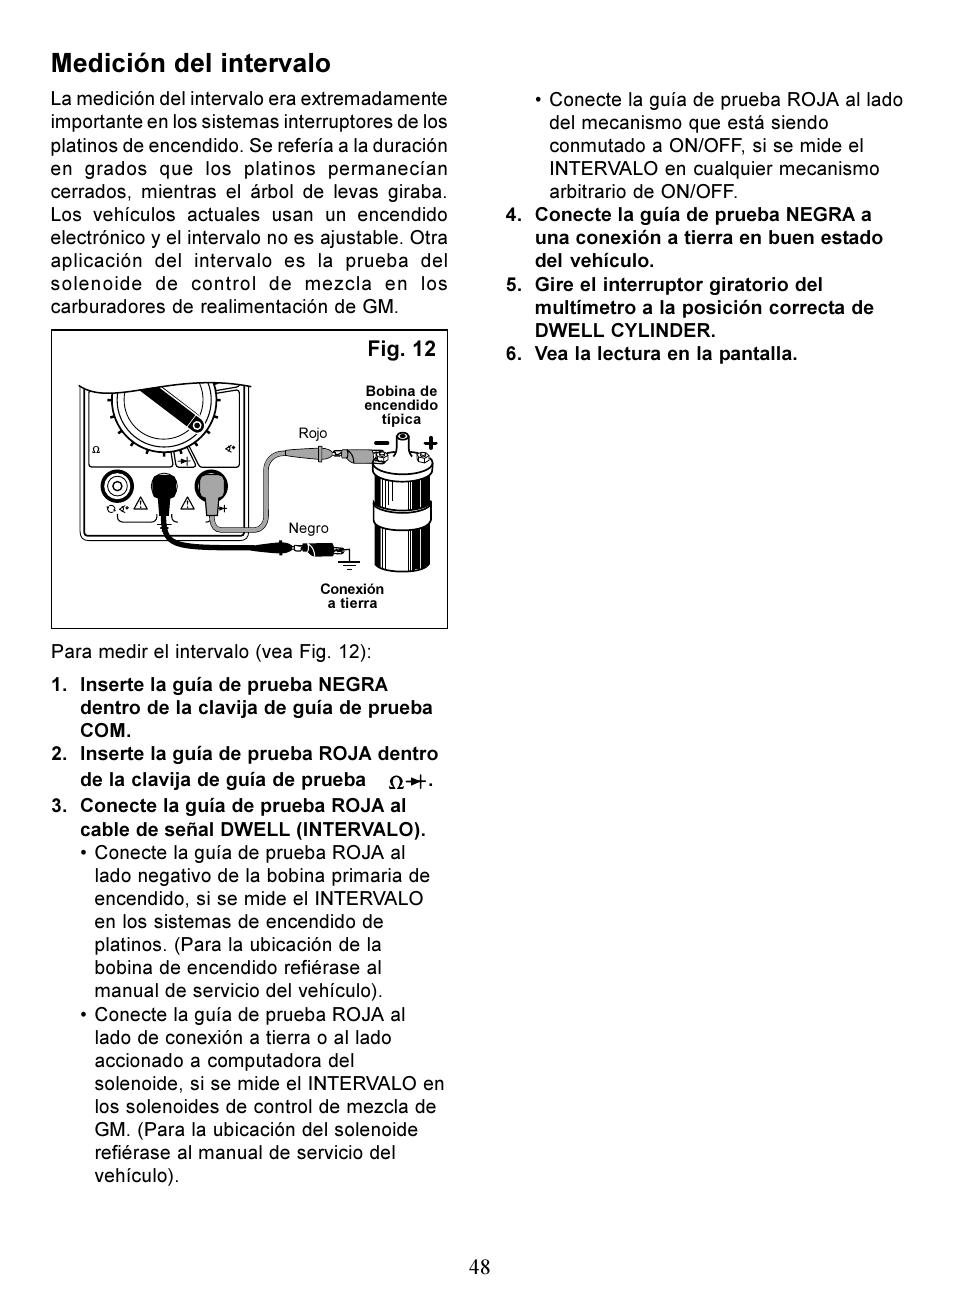 medici n del intervalo fig 12 actron digital multimeter cp7676 rh manualsdir com Actron CP7672 Digital Multitester Actron Automotive DMM